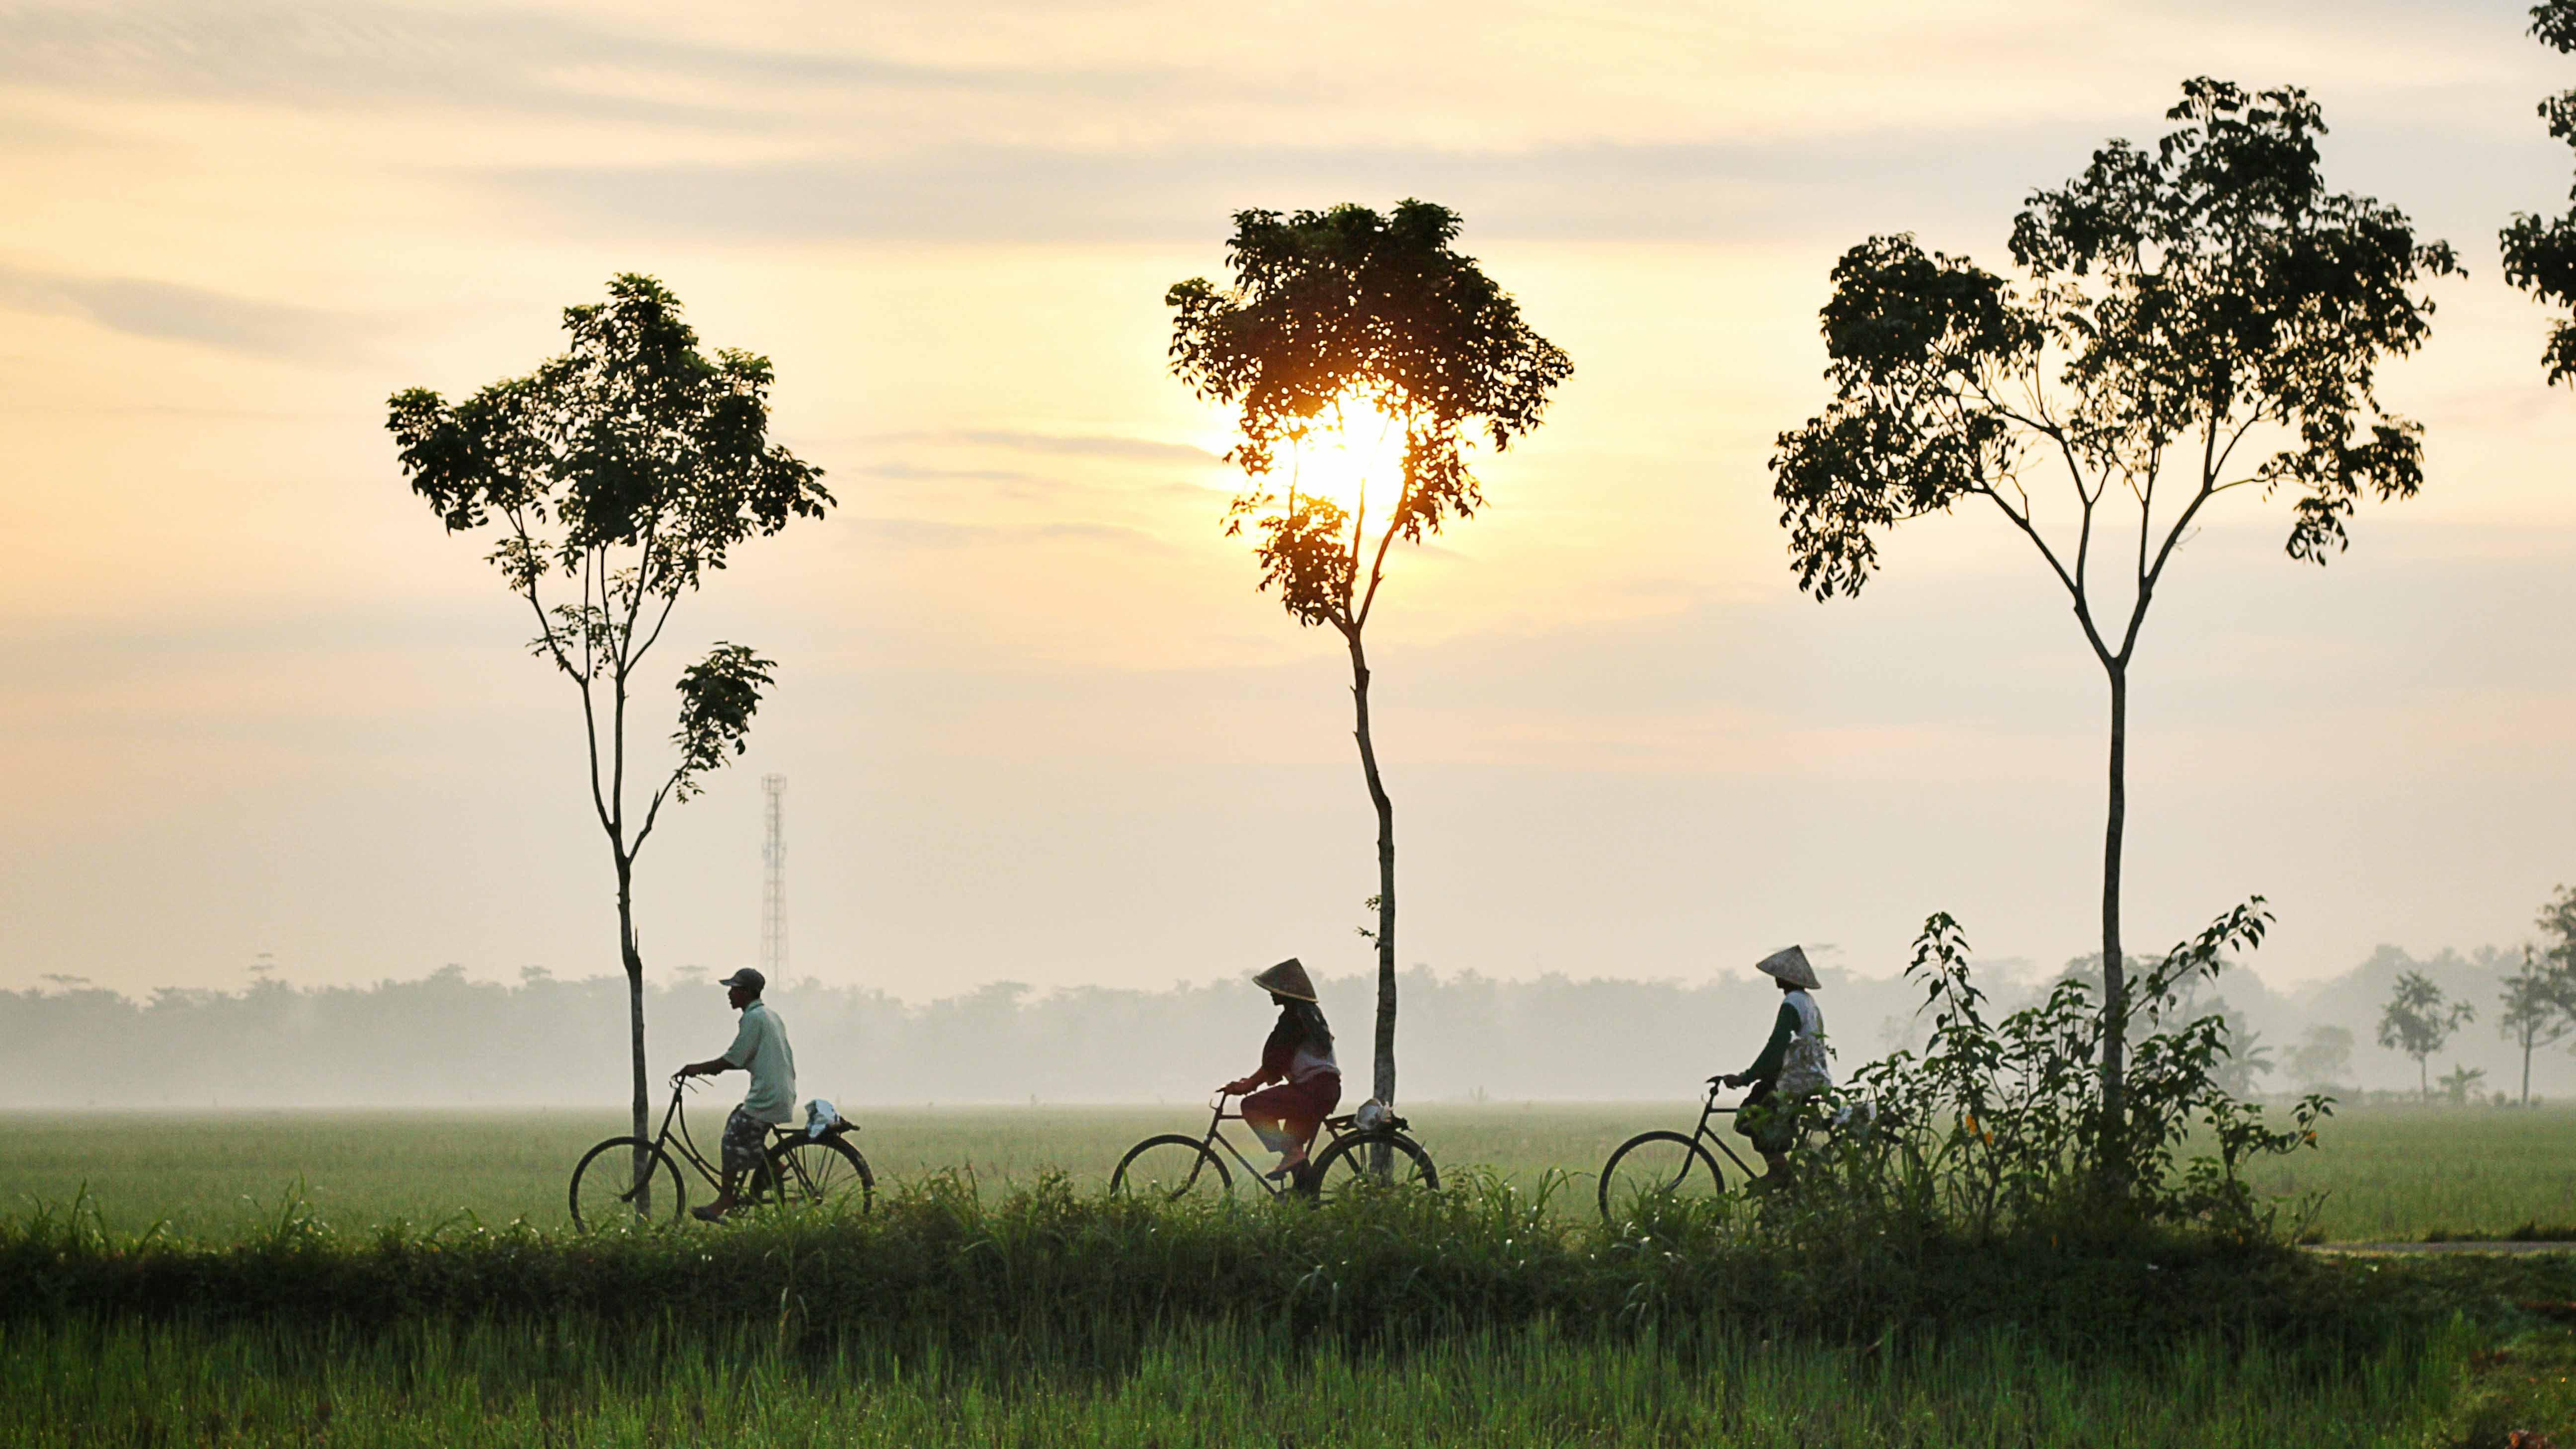 bicycle-riding-947336